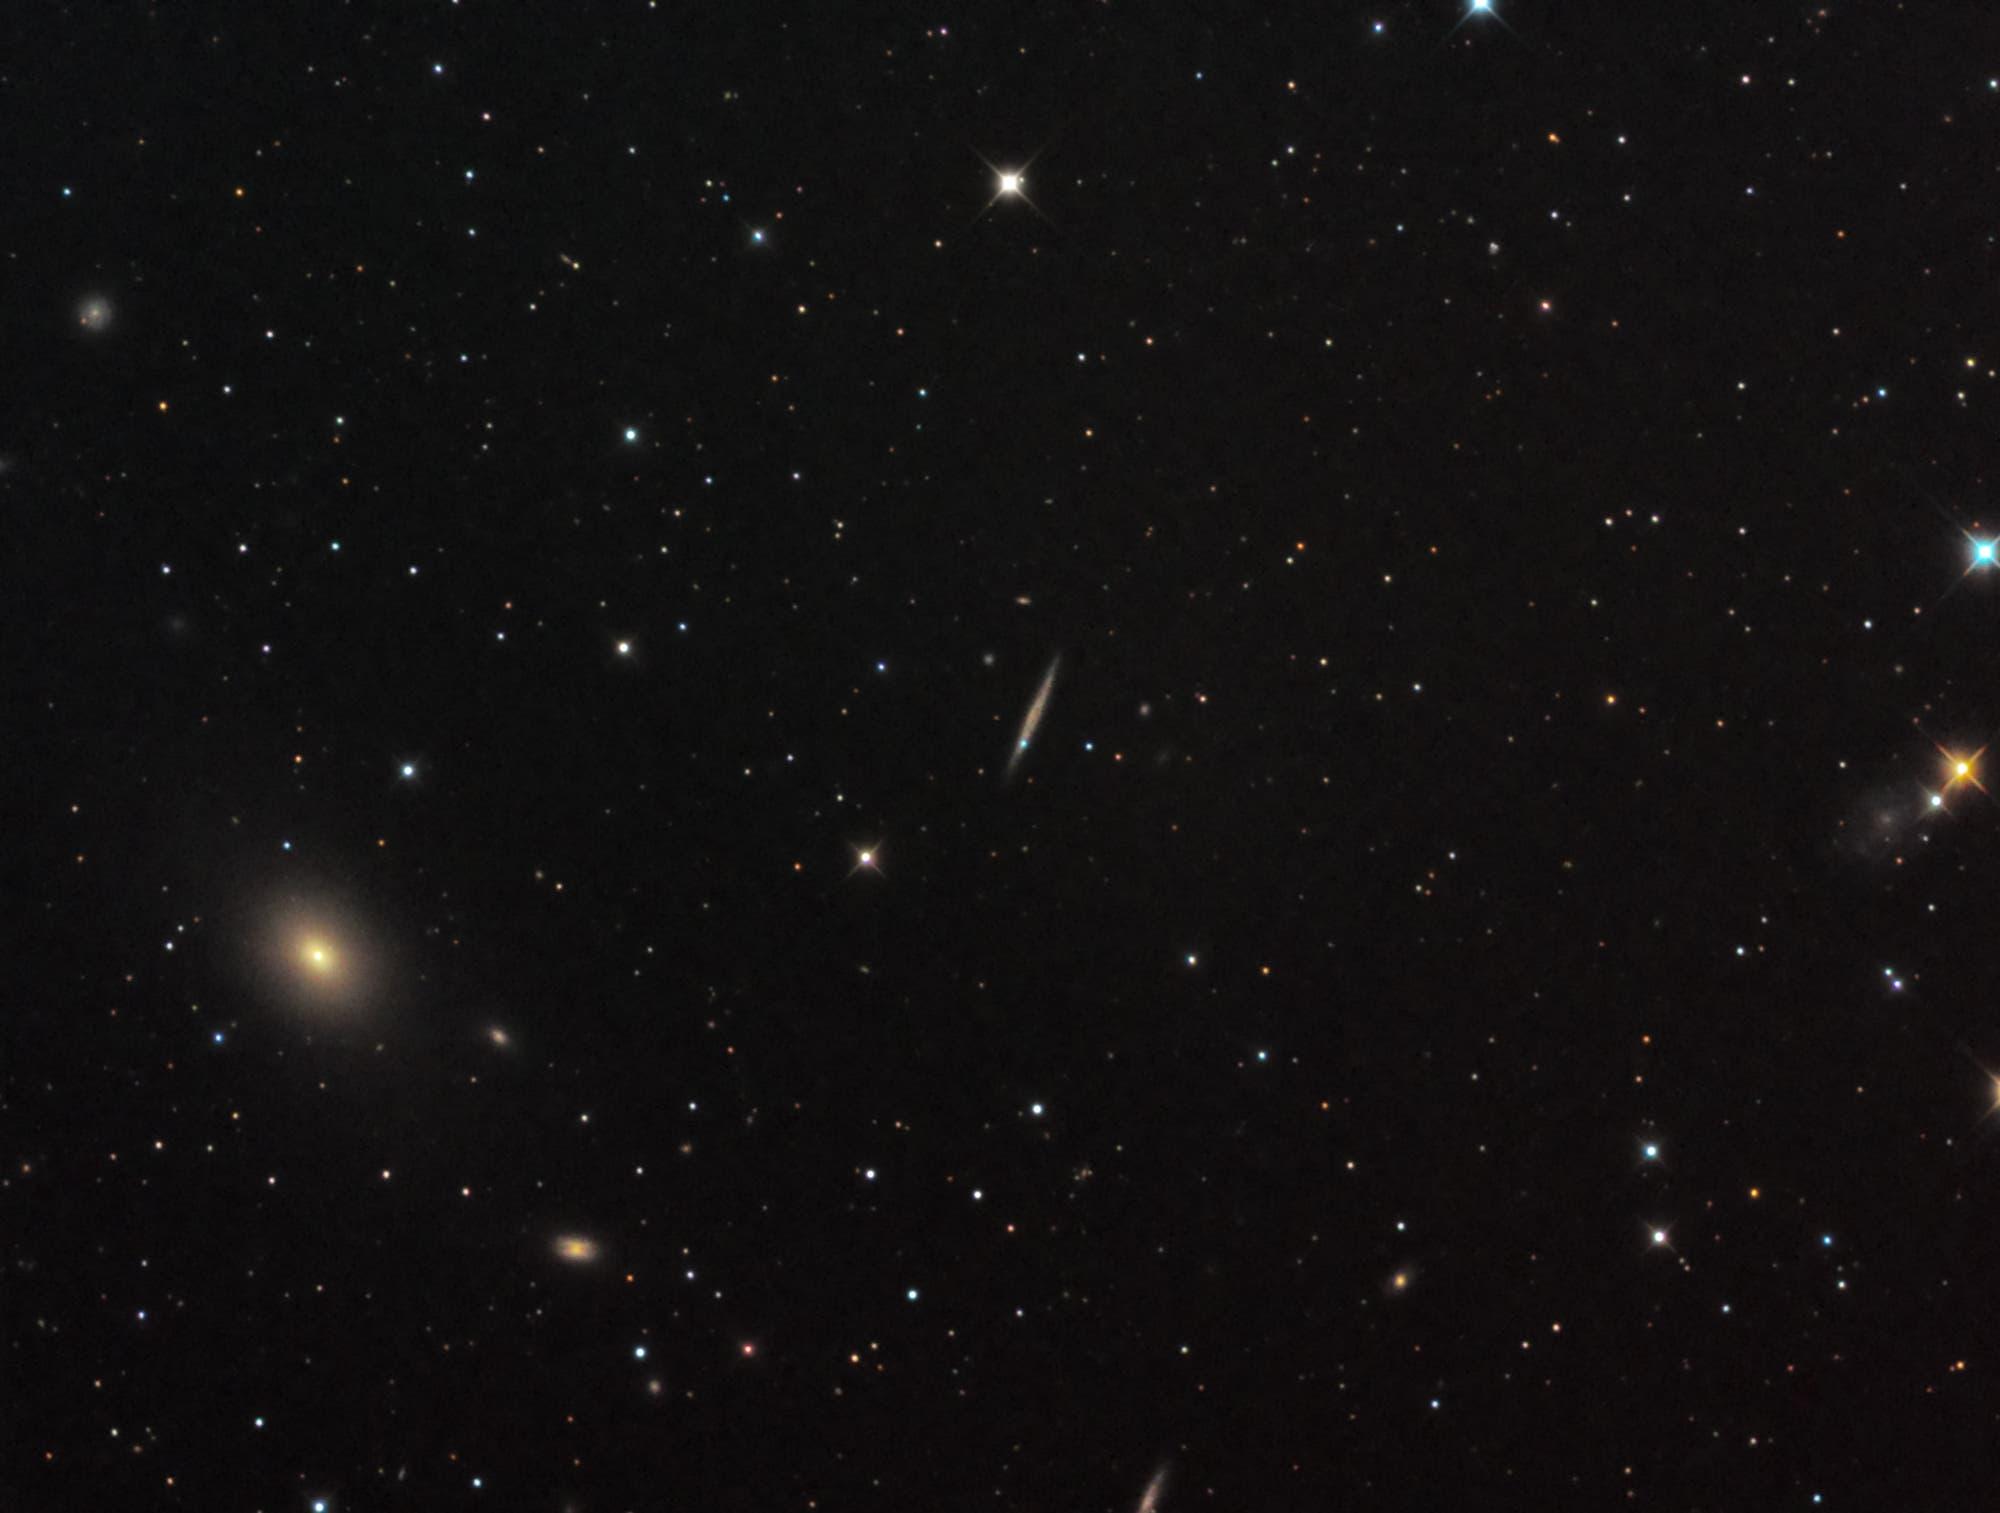 Supernova Typ Ia - SN 2021 hiz